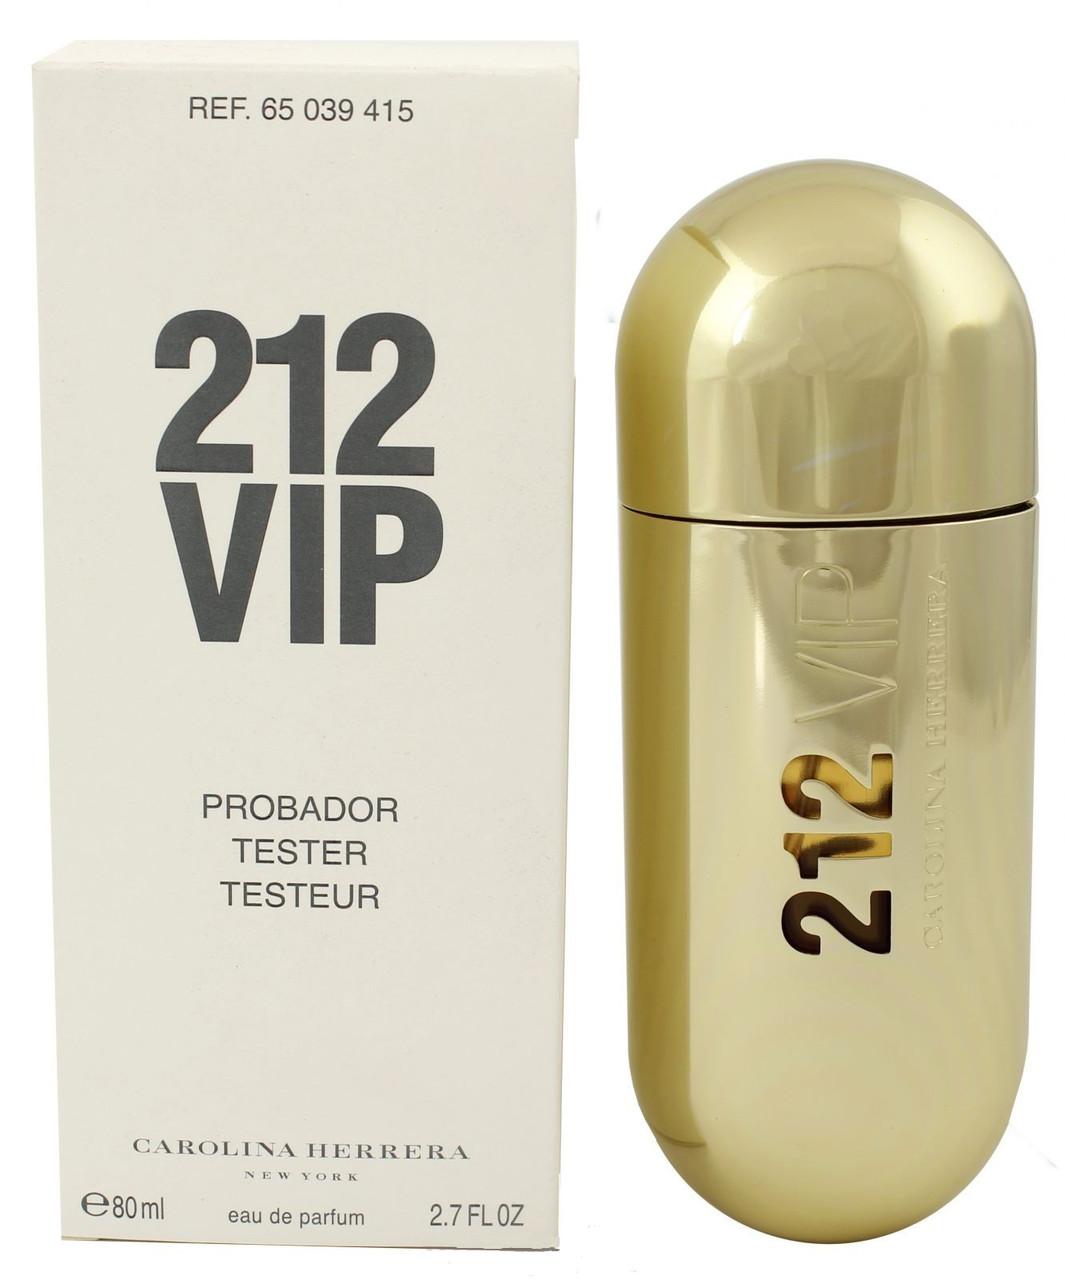 Carolina Herrera 212 VIP for Women парфюмированная вода 80 ml. (Тестер Каролина Херрера 212 Вип Фор Вумен)